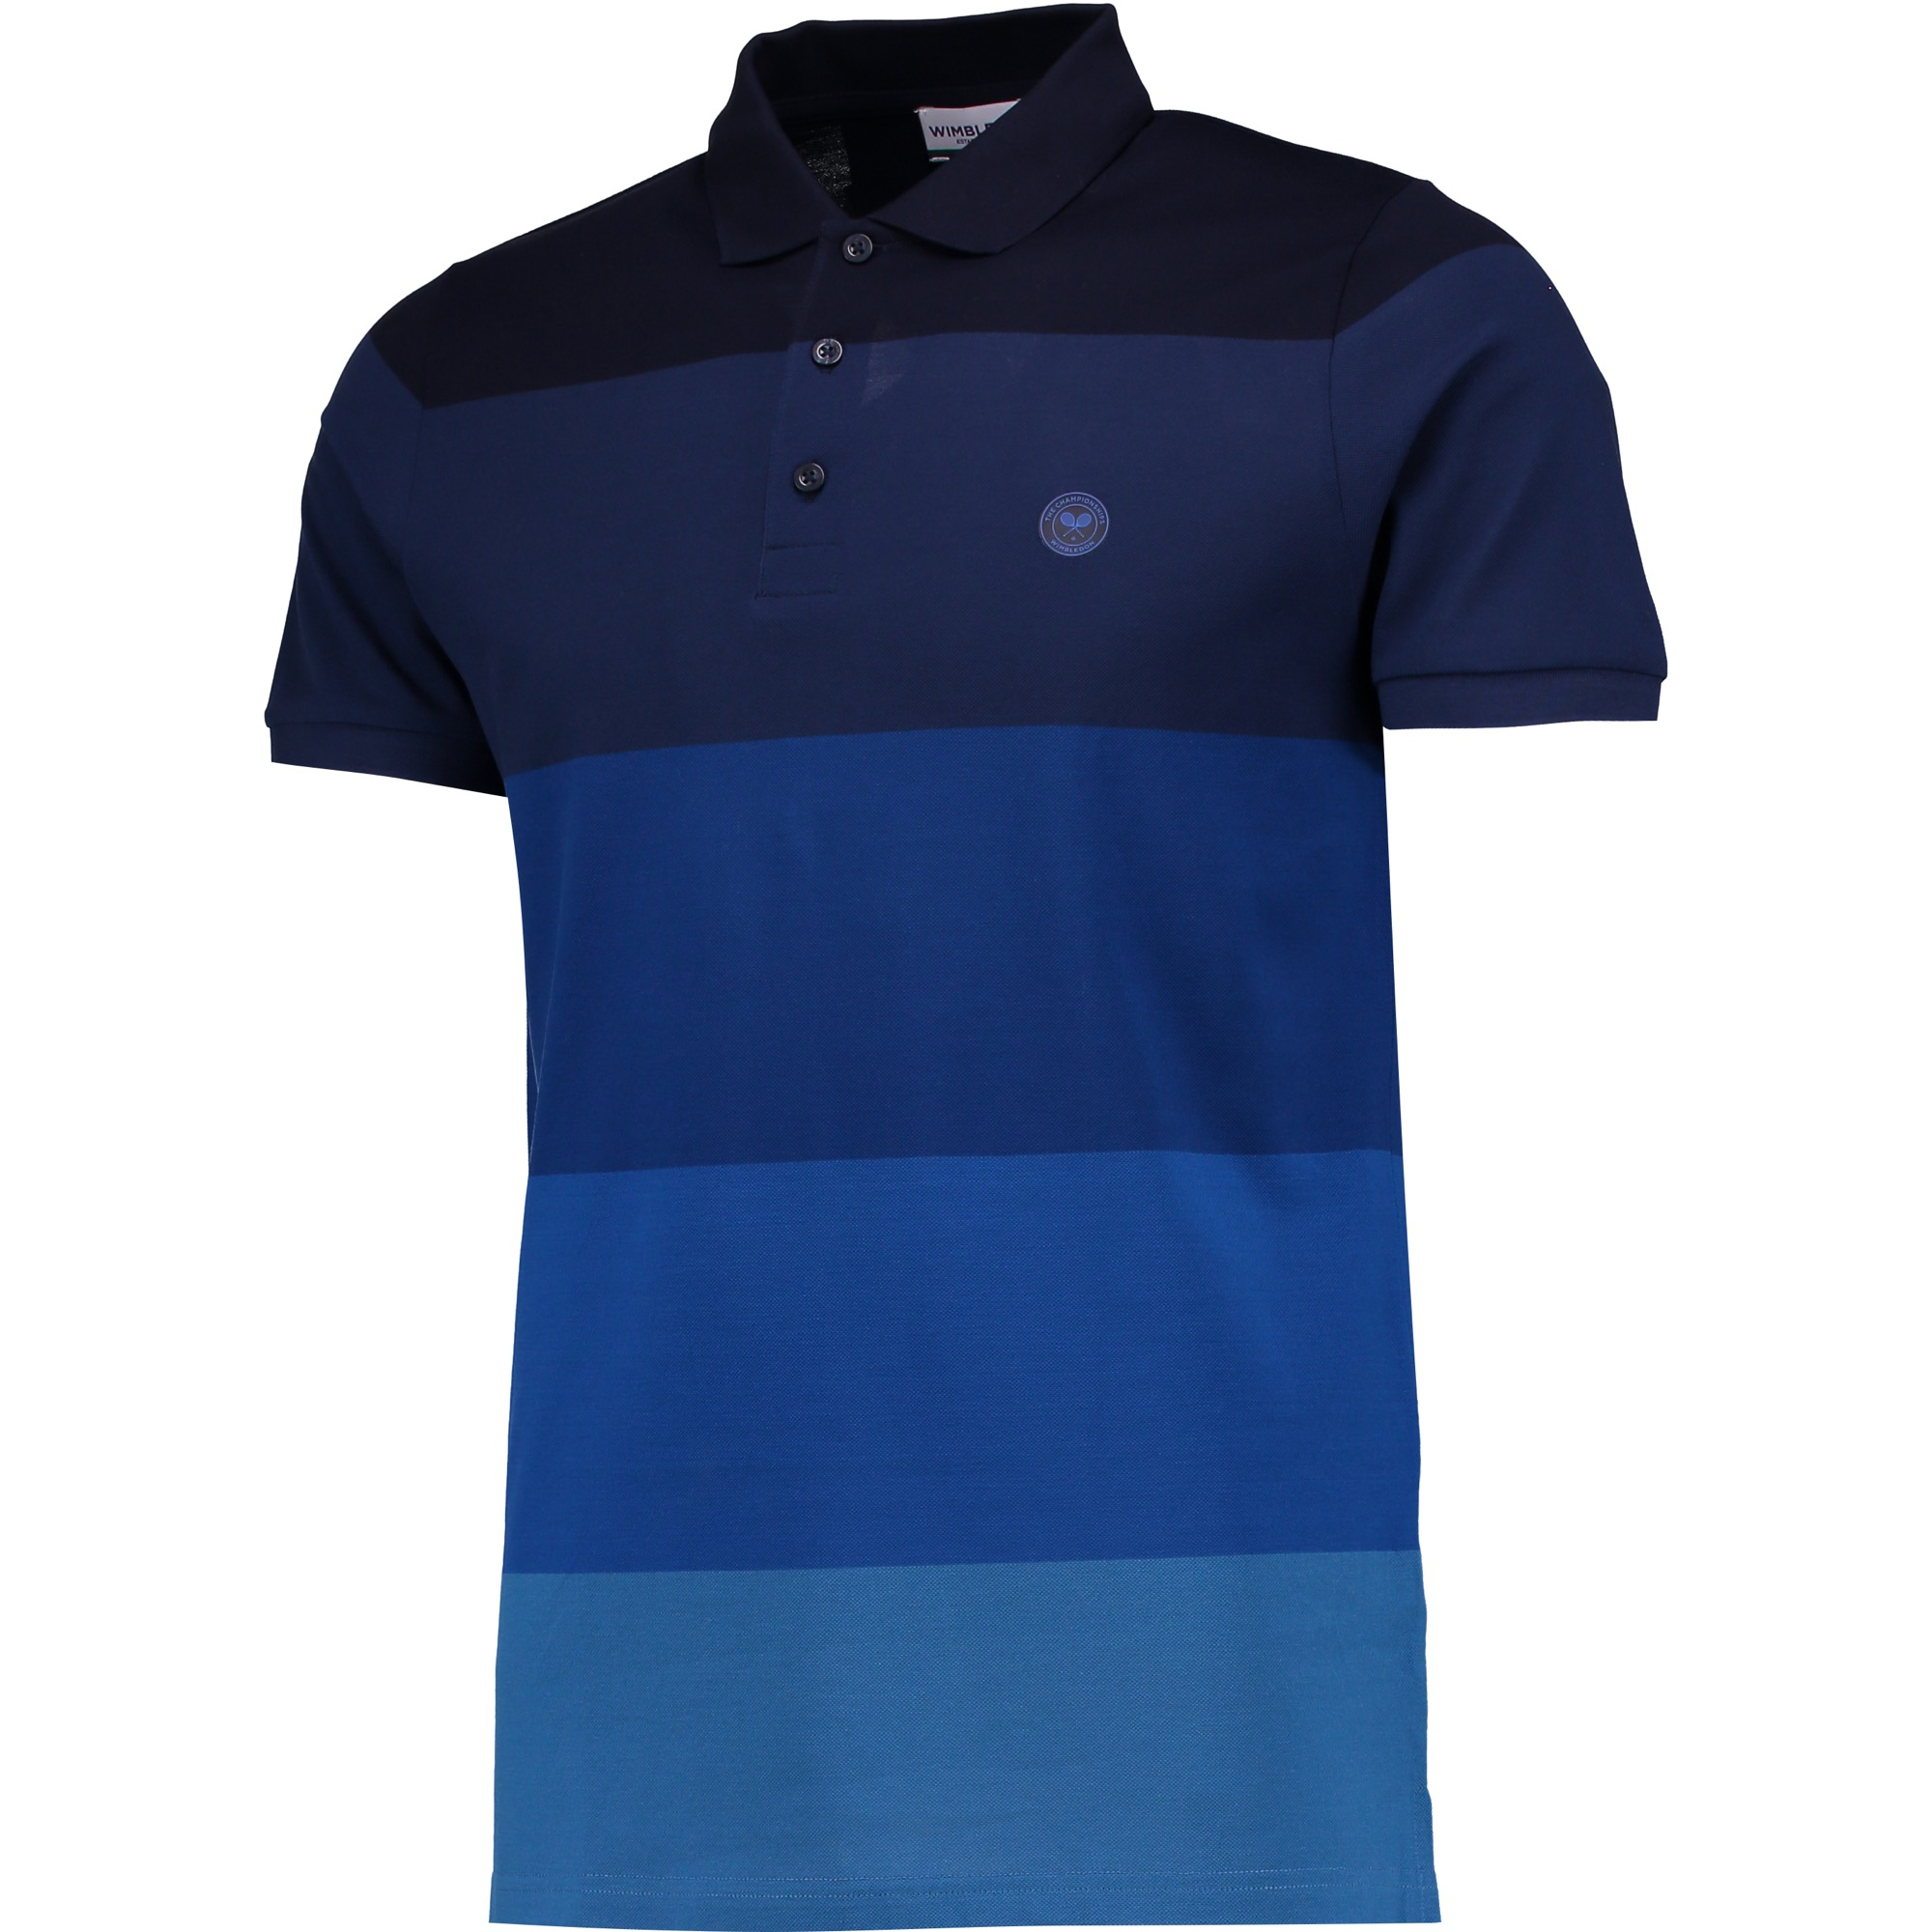 Wimbledon Ombre Polo Shirt - Midnight